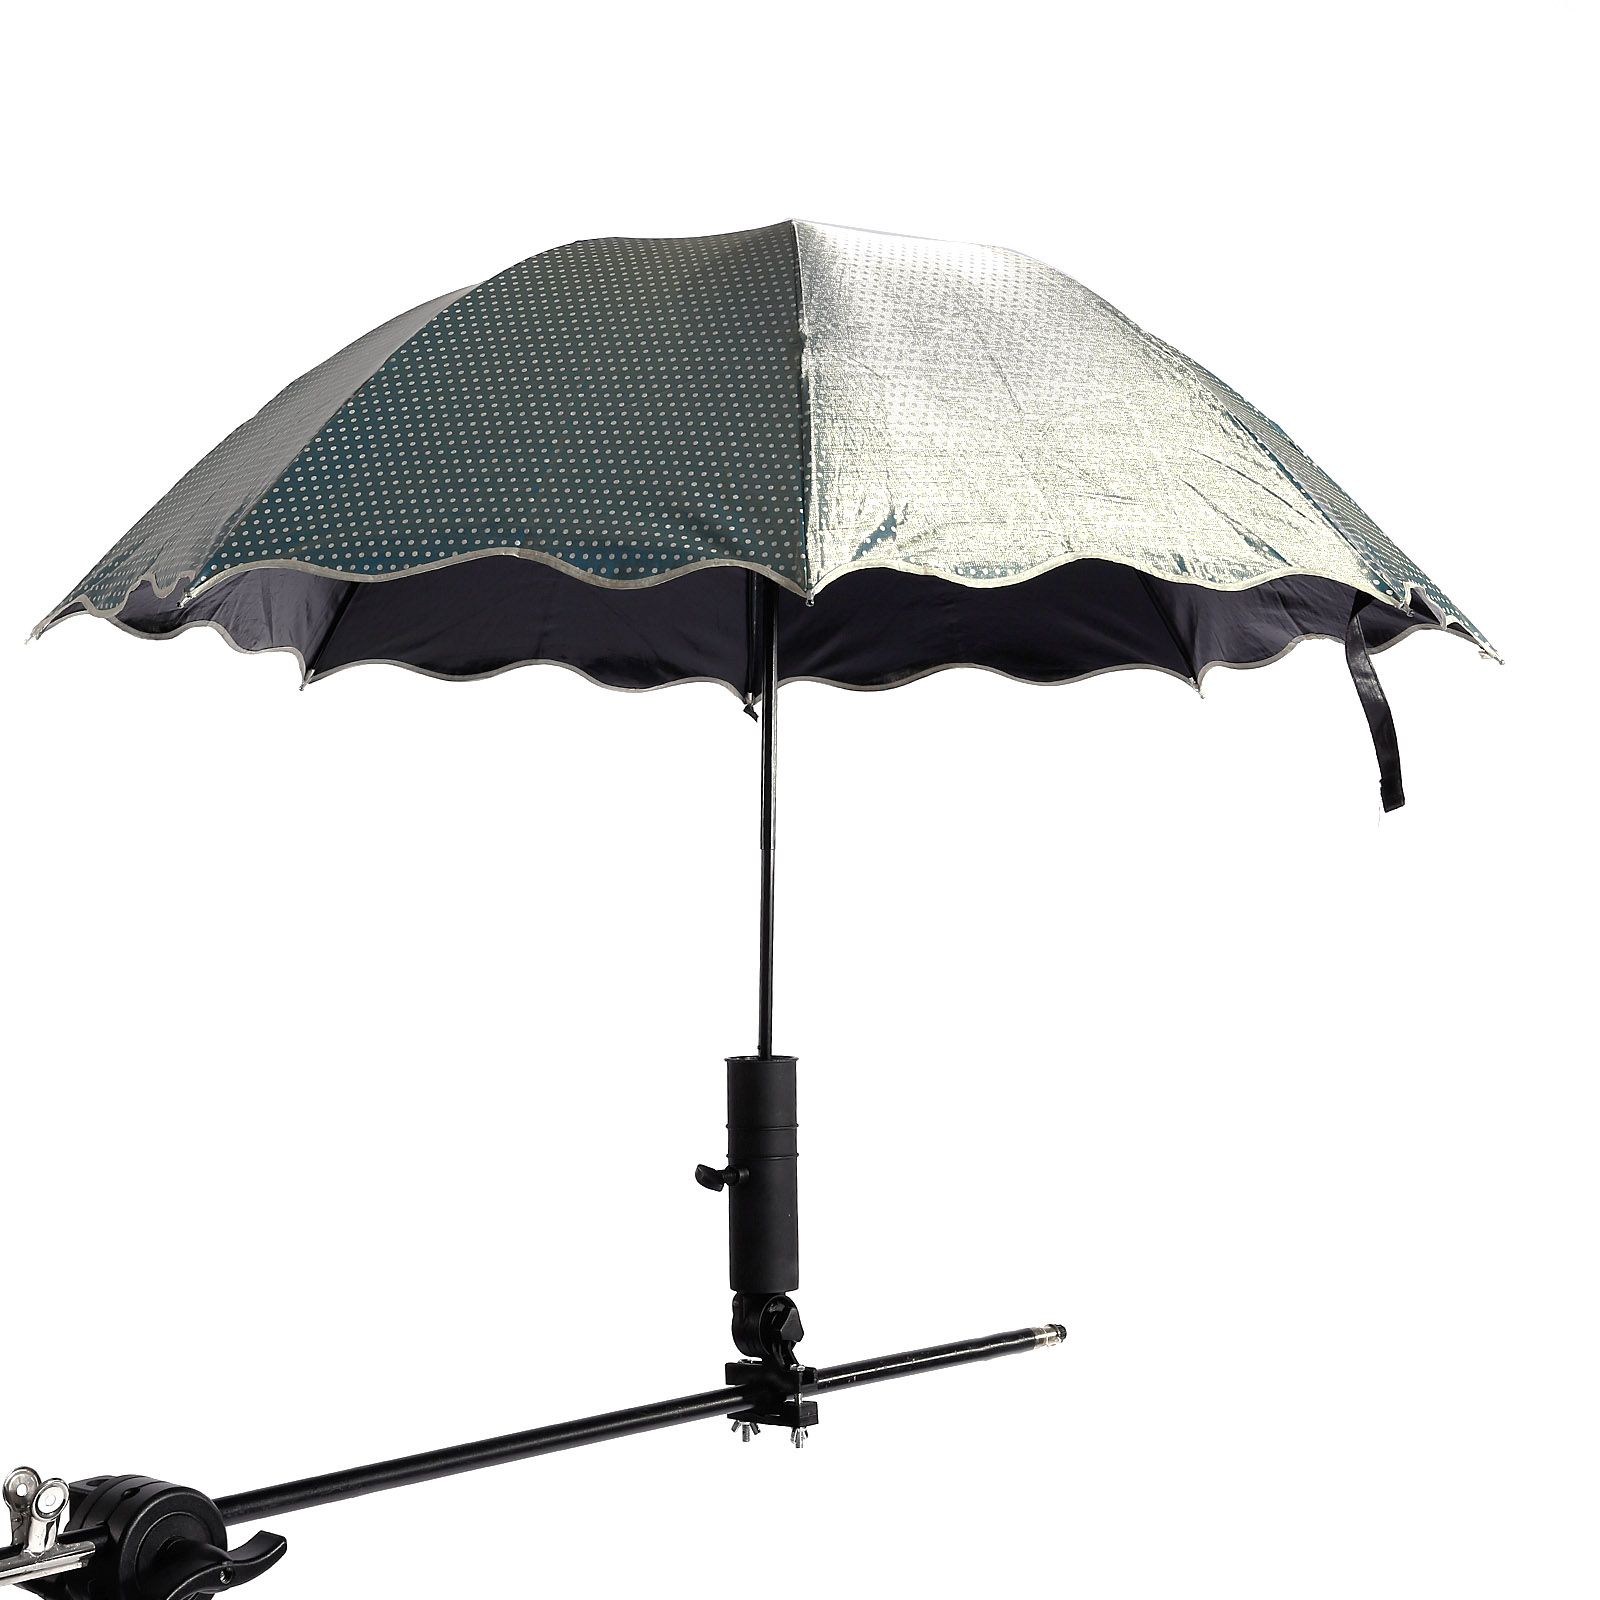 Umbrella Stand Golf: Universal Golf Cart Umbrella Holder Hands Free Protection